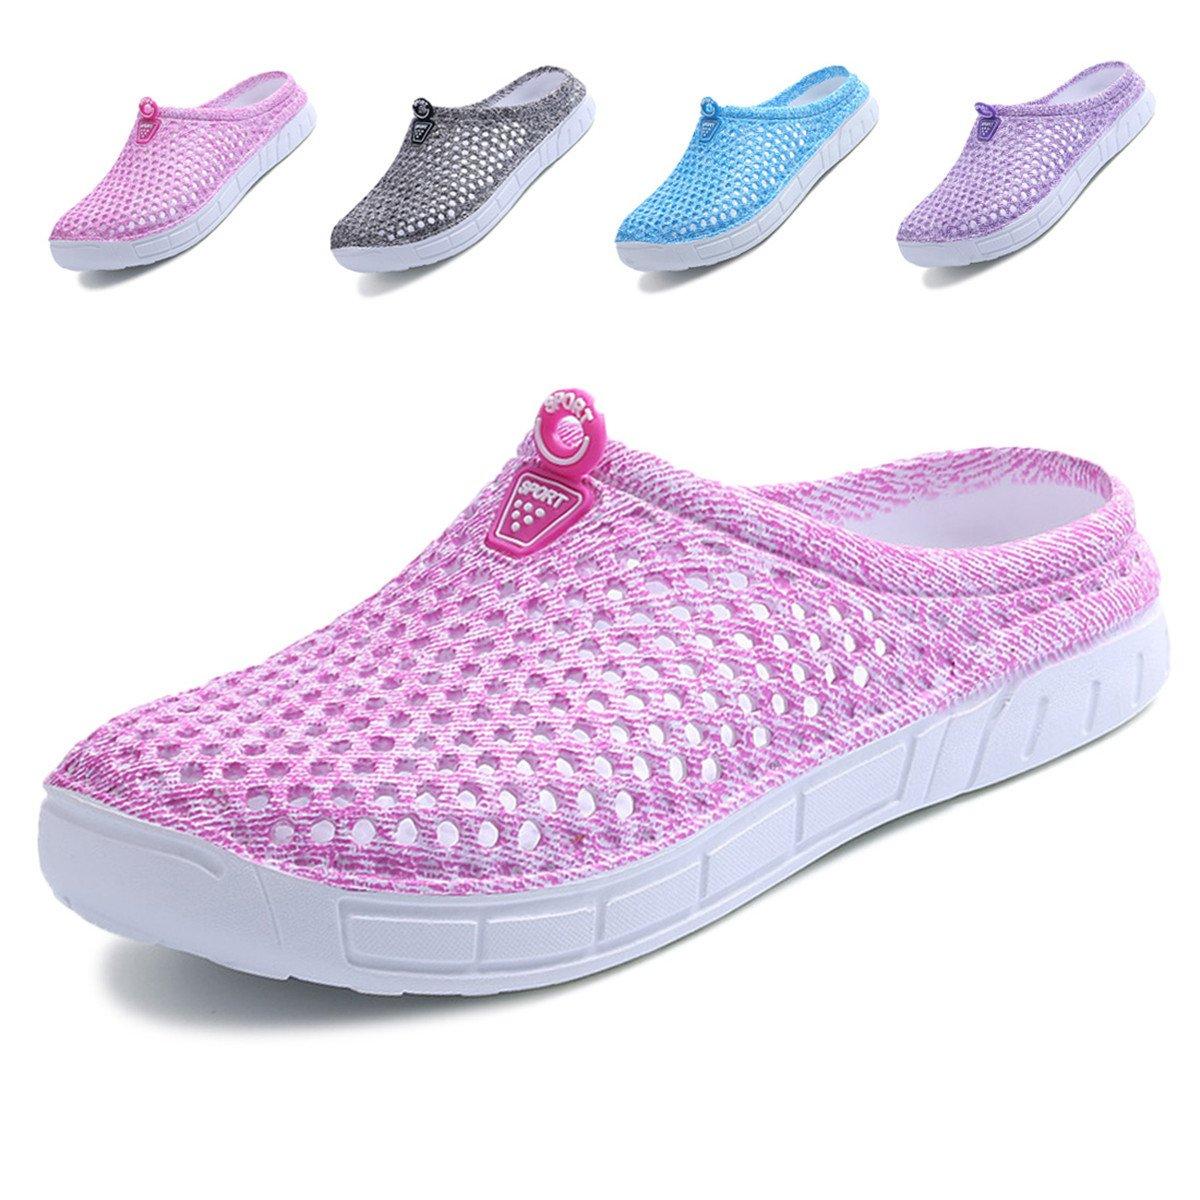 Ginjang Women's Garden Clogs Shoes Slip-on Slippers Sandals(39/Pink) by Ginjang (Image #1)